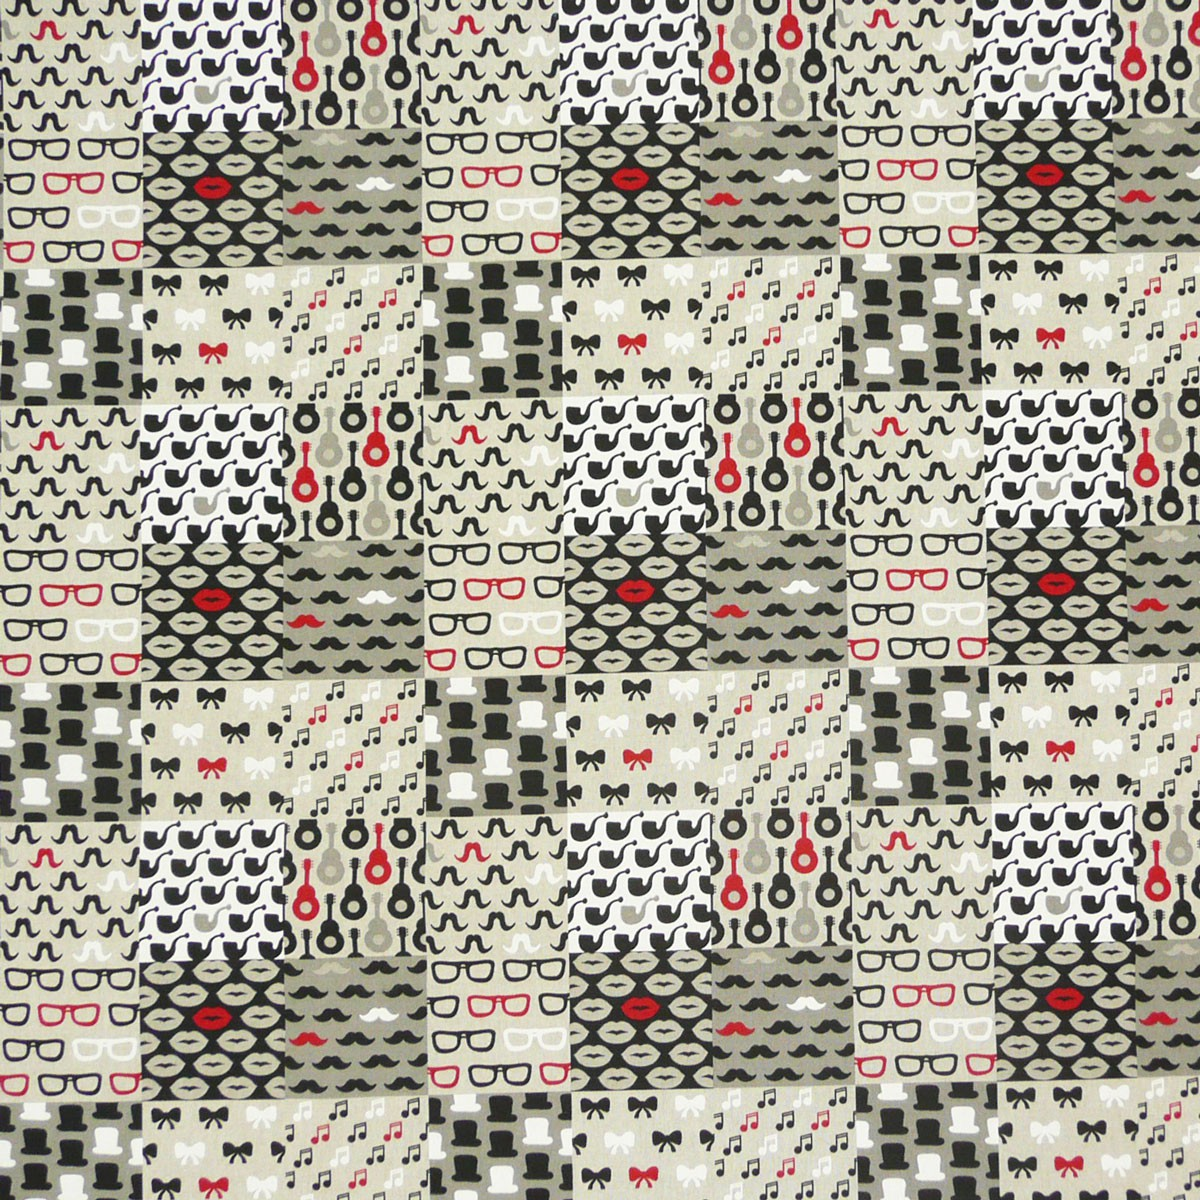 gardinenstoff stoff dekostoff meterware patchwork moustache brille noten pfeife ebay. Black Bedroom Furniture Sets. Home Design Ideas